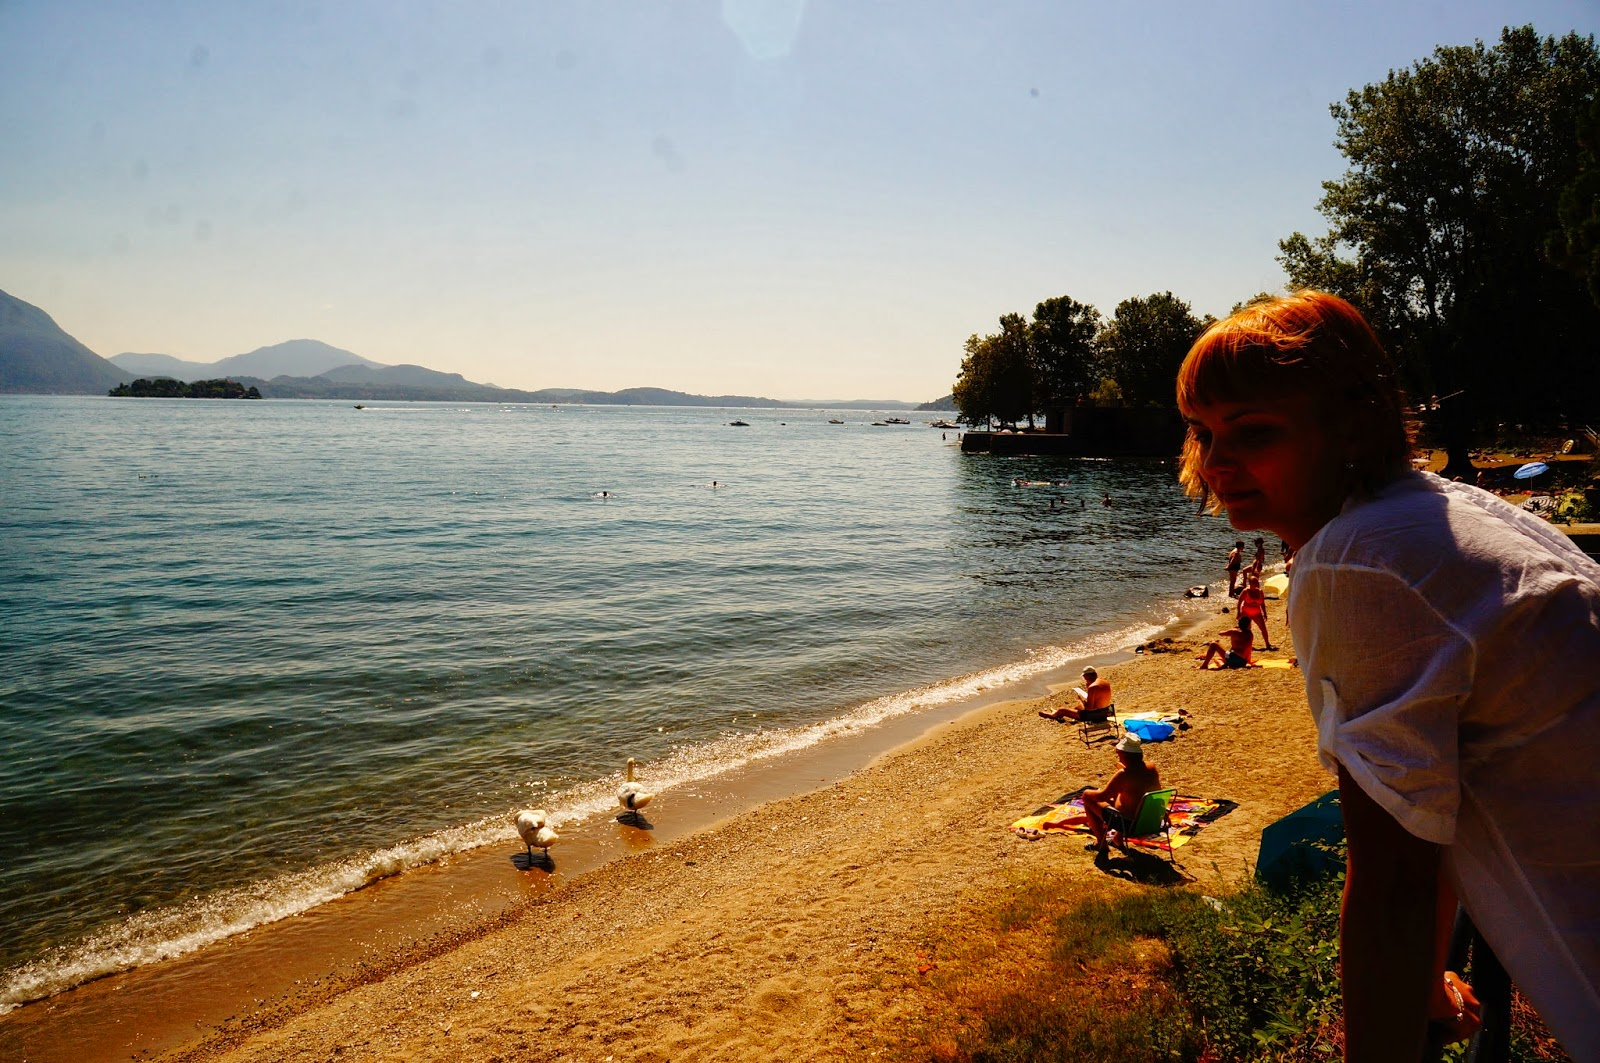 Beach-Baveno